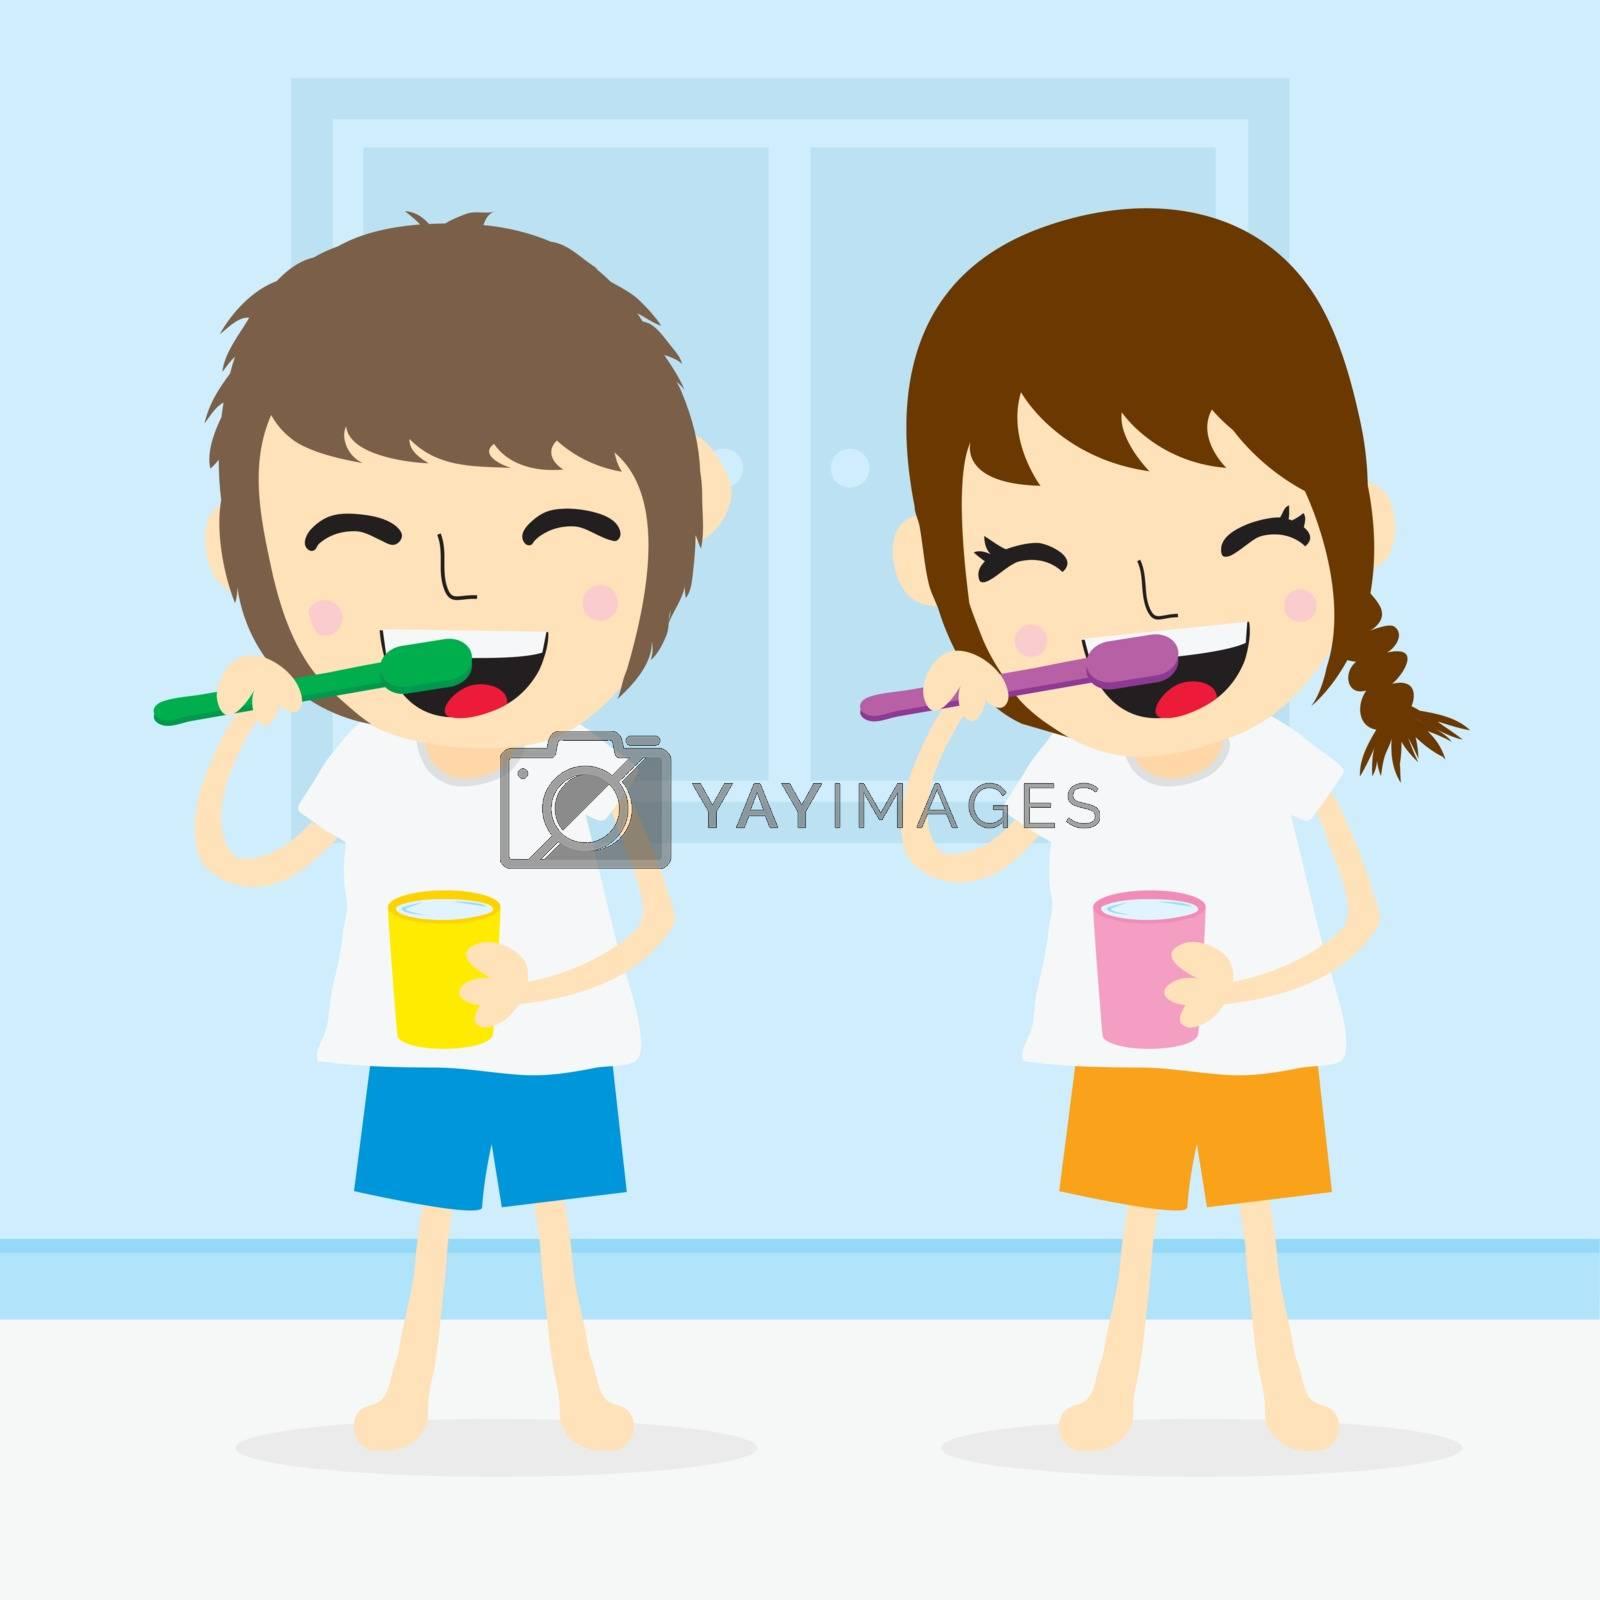 Royalty free image of Kid boy and girl brushing teeth cartoon vector by Ienjoyeverytime